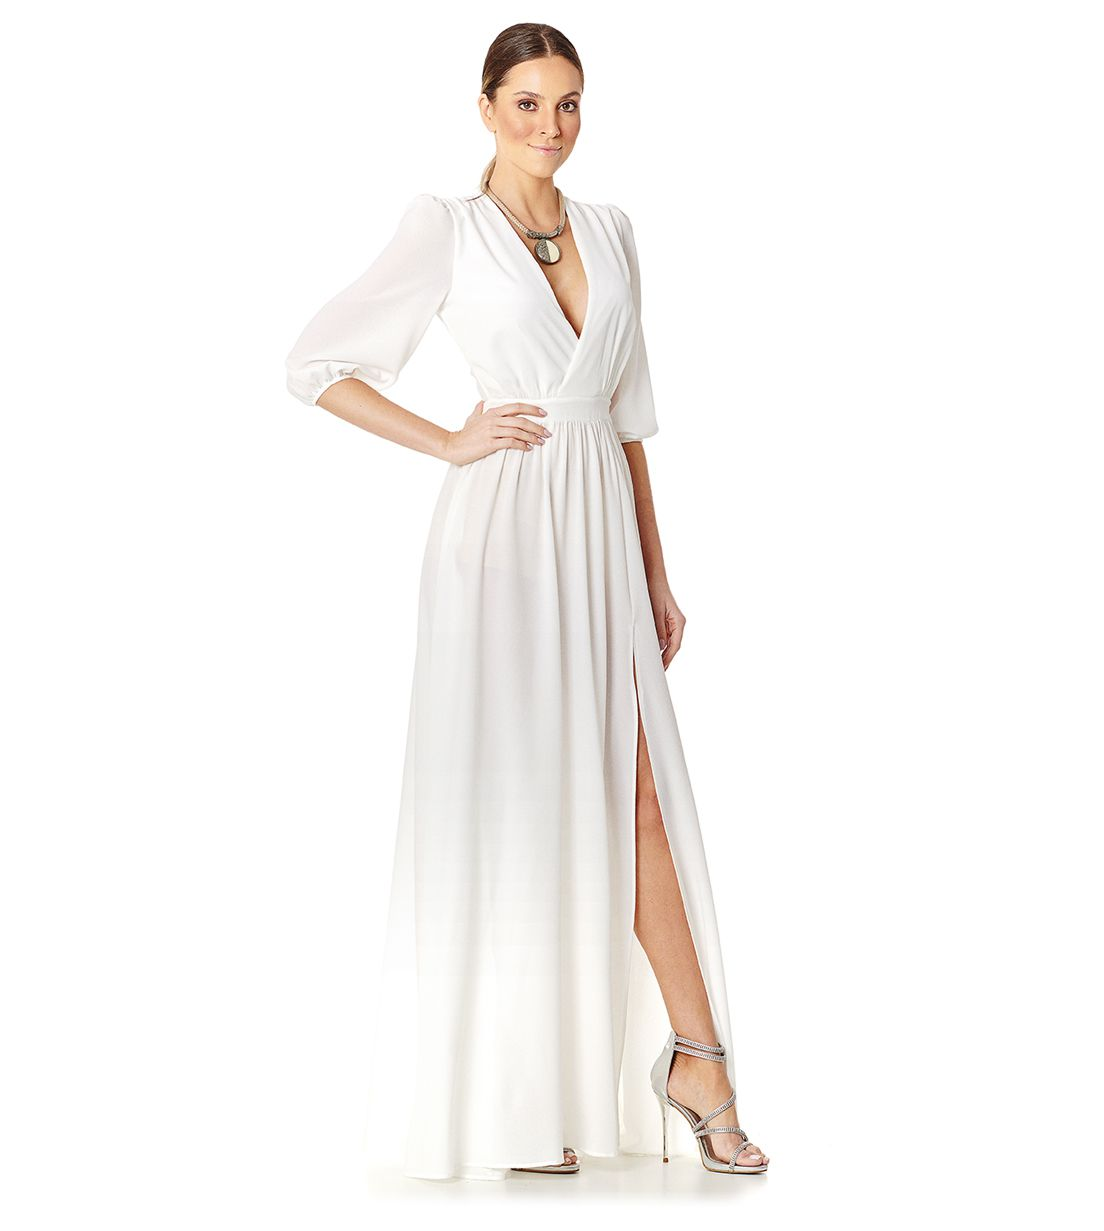 Vestido Longo Manga 3/4 Branco Lala Dubi